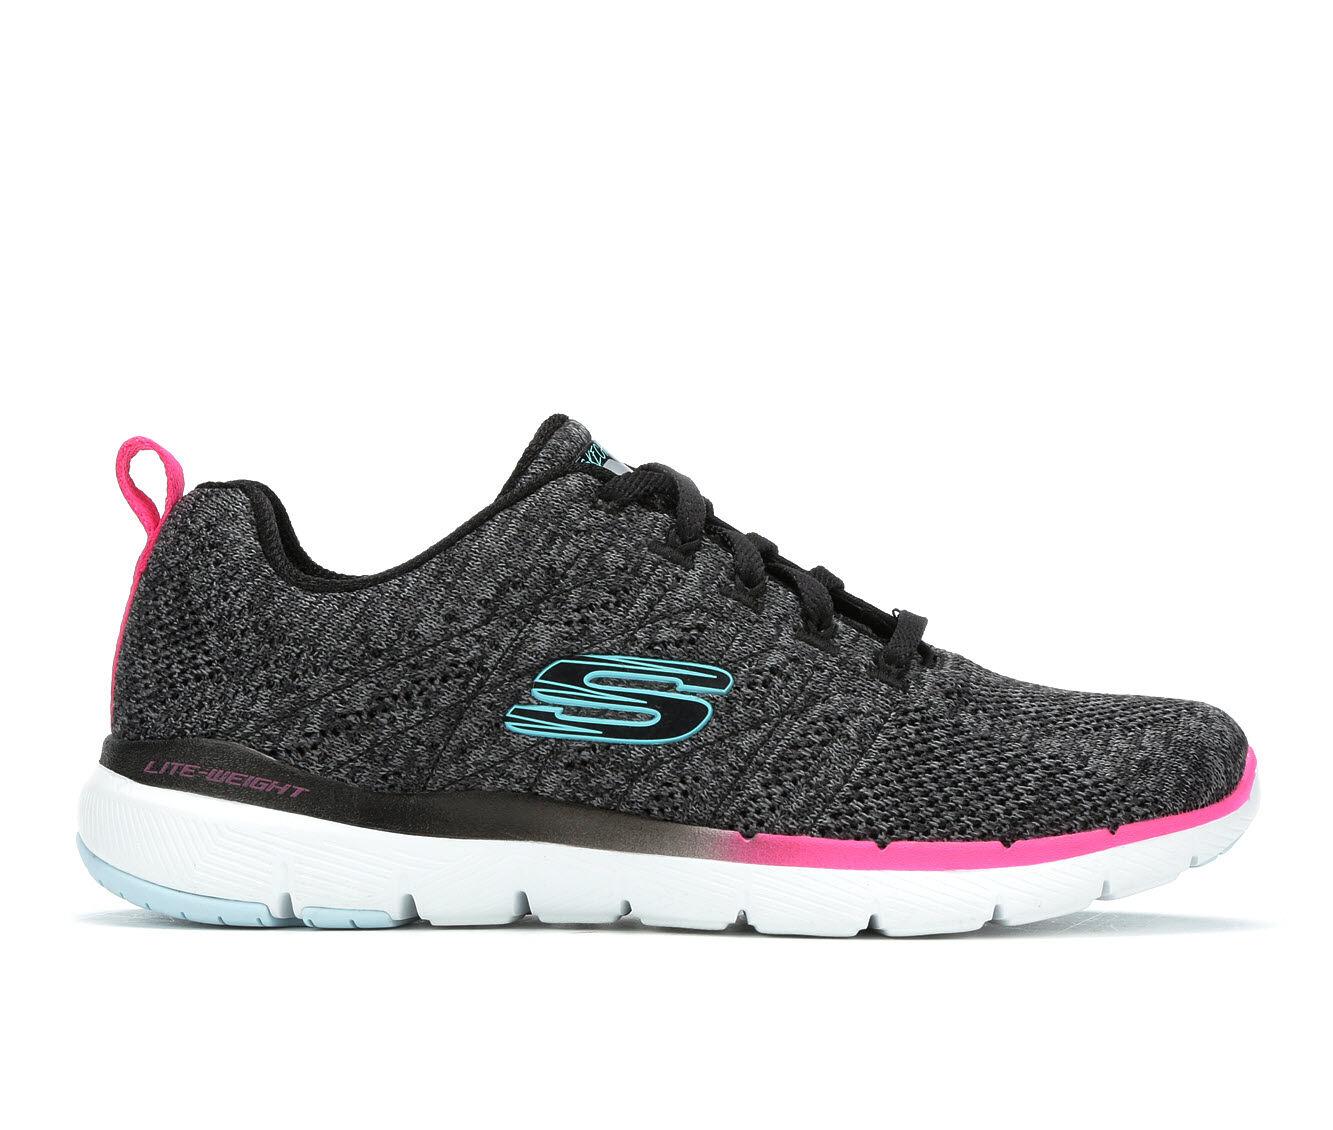 The Most Popular Women's Skechers Reinfall 13058 Sneakers Black/Blue/Pink